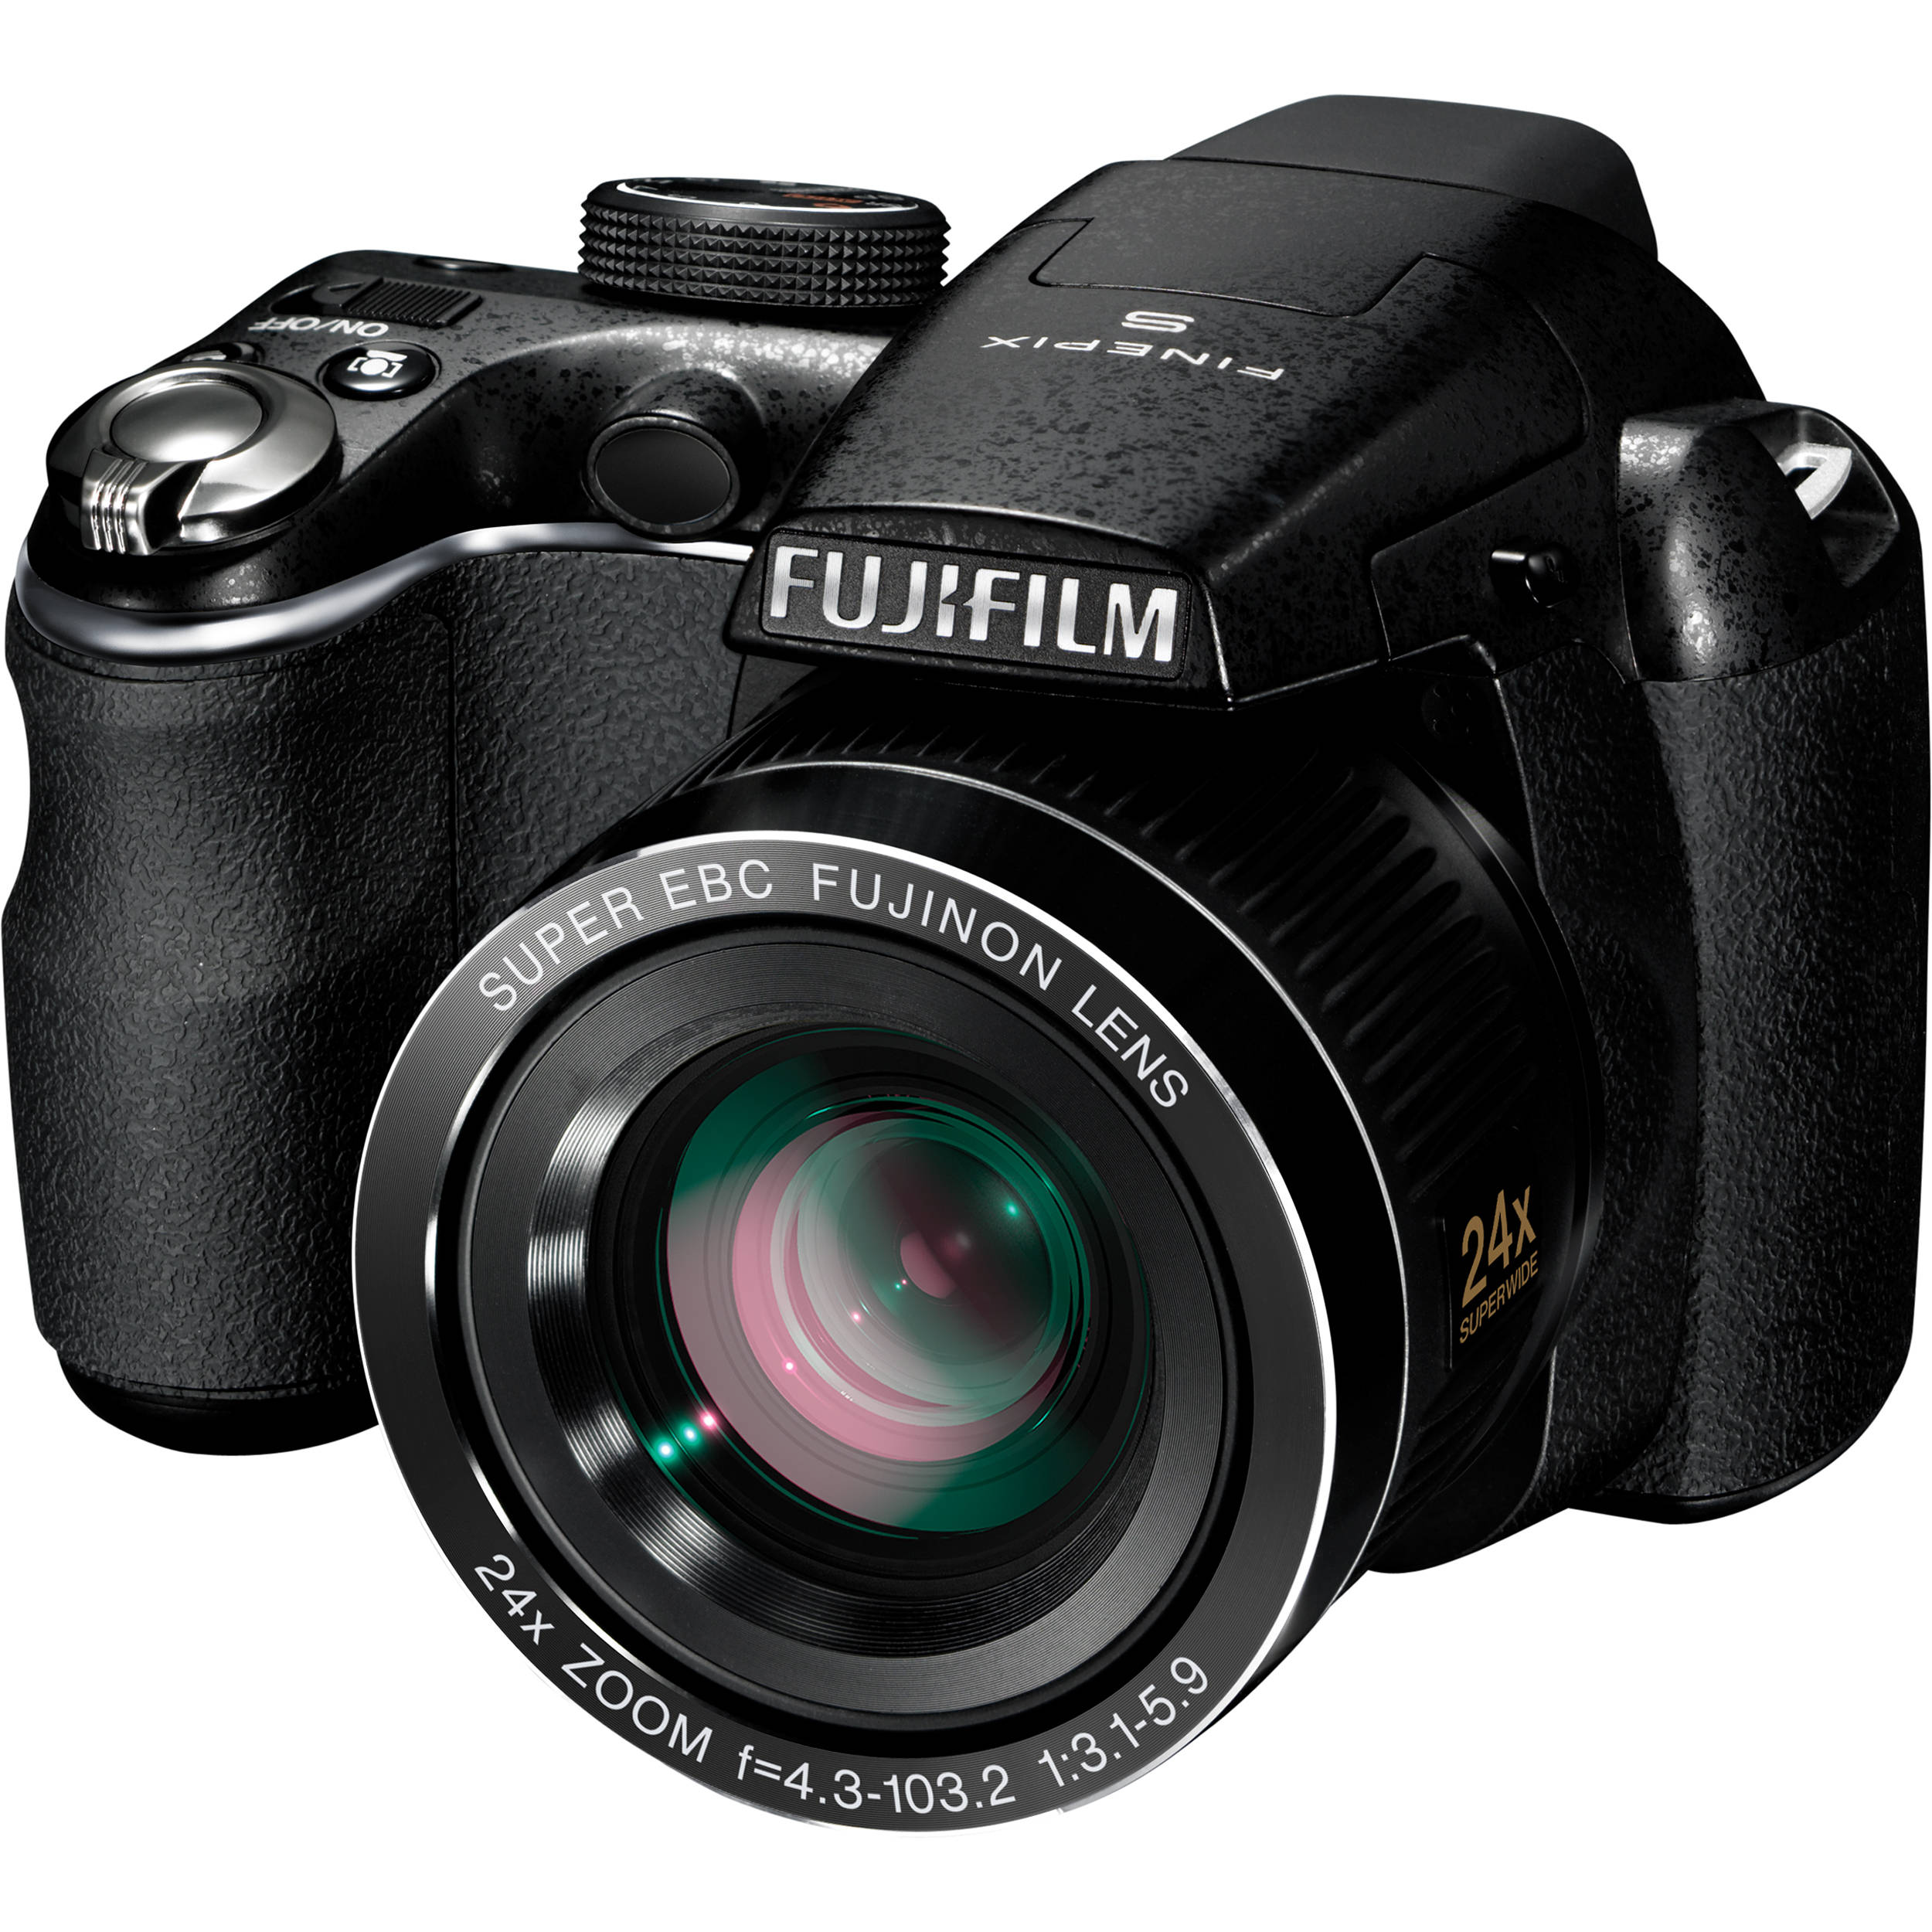 fujifilm finepix s3200 14mp digital camera black 16123737 b h rh bhphotovideo com